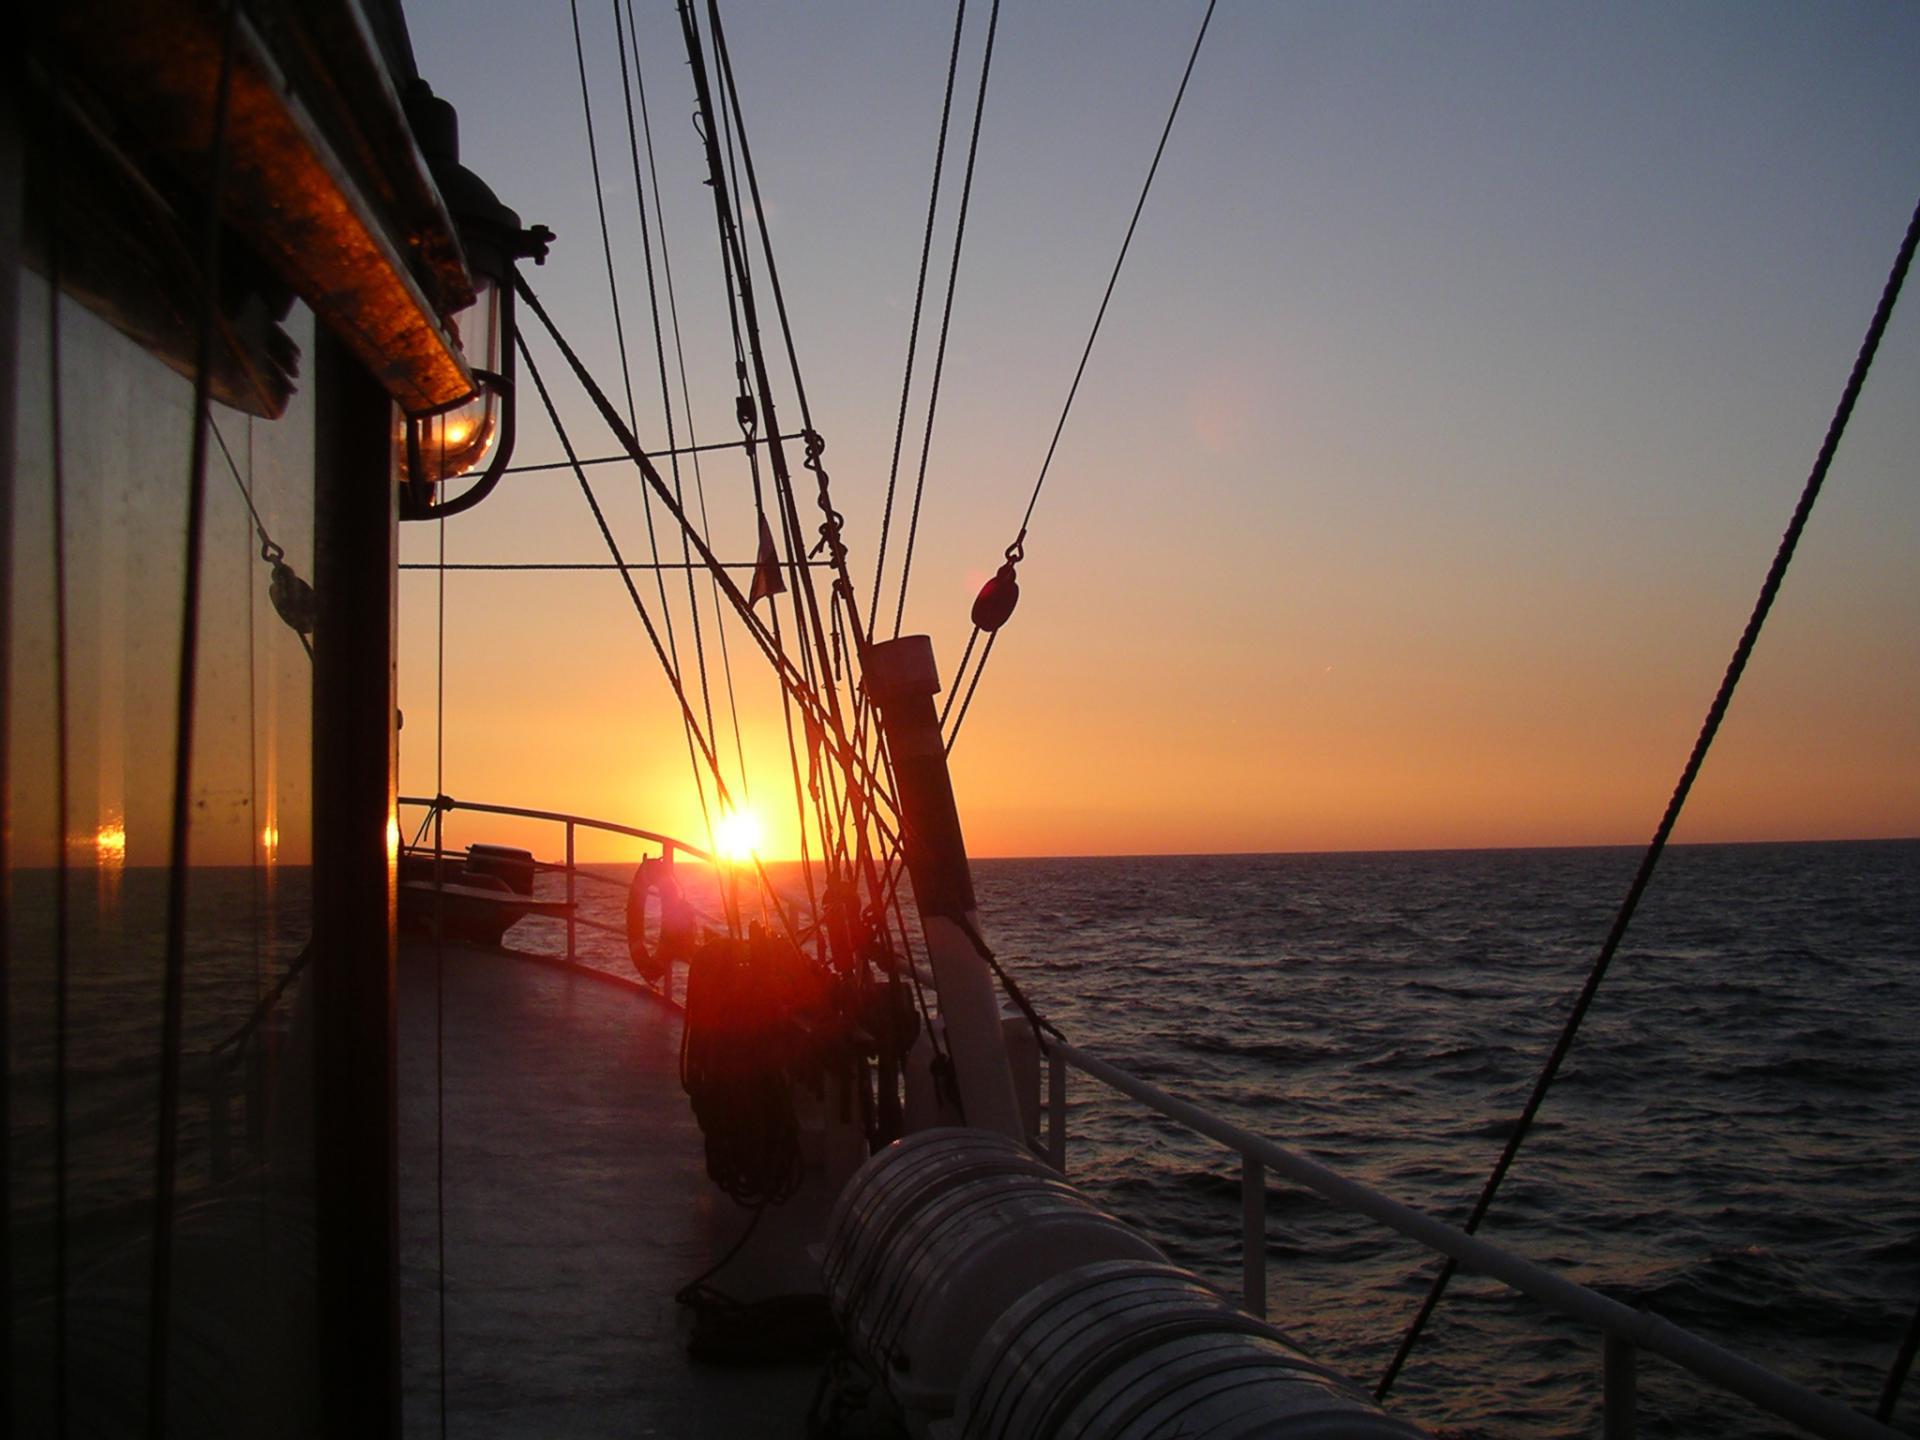 Sonnenuntergang an Bord der Artemis